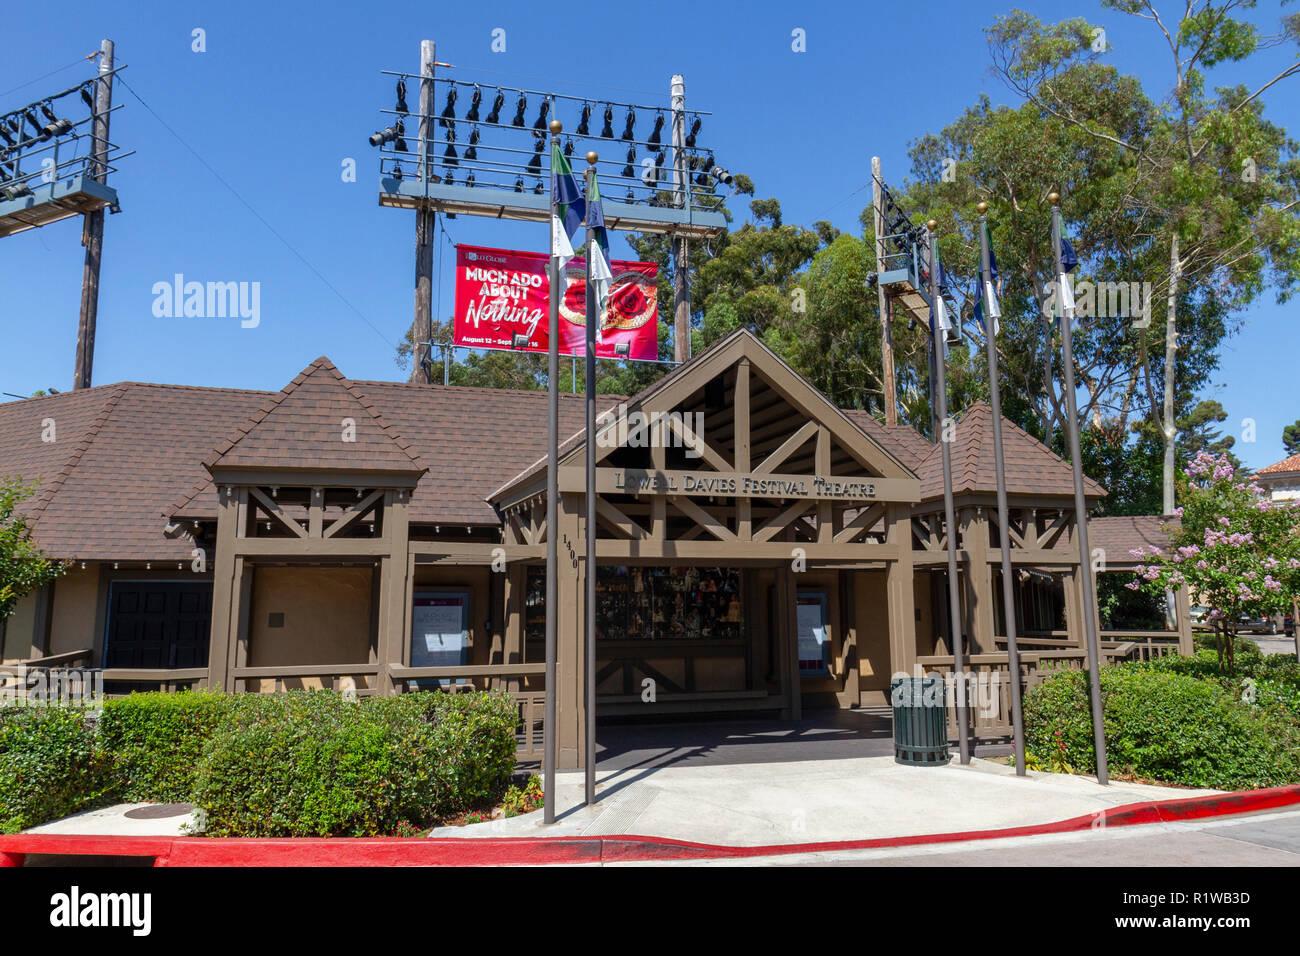 The Lowell Davis Festival Theatre in Balboa Park, San Diego, California, United States. - Stock Image